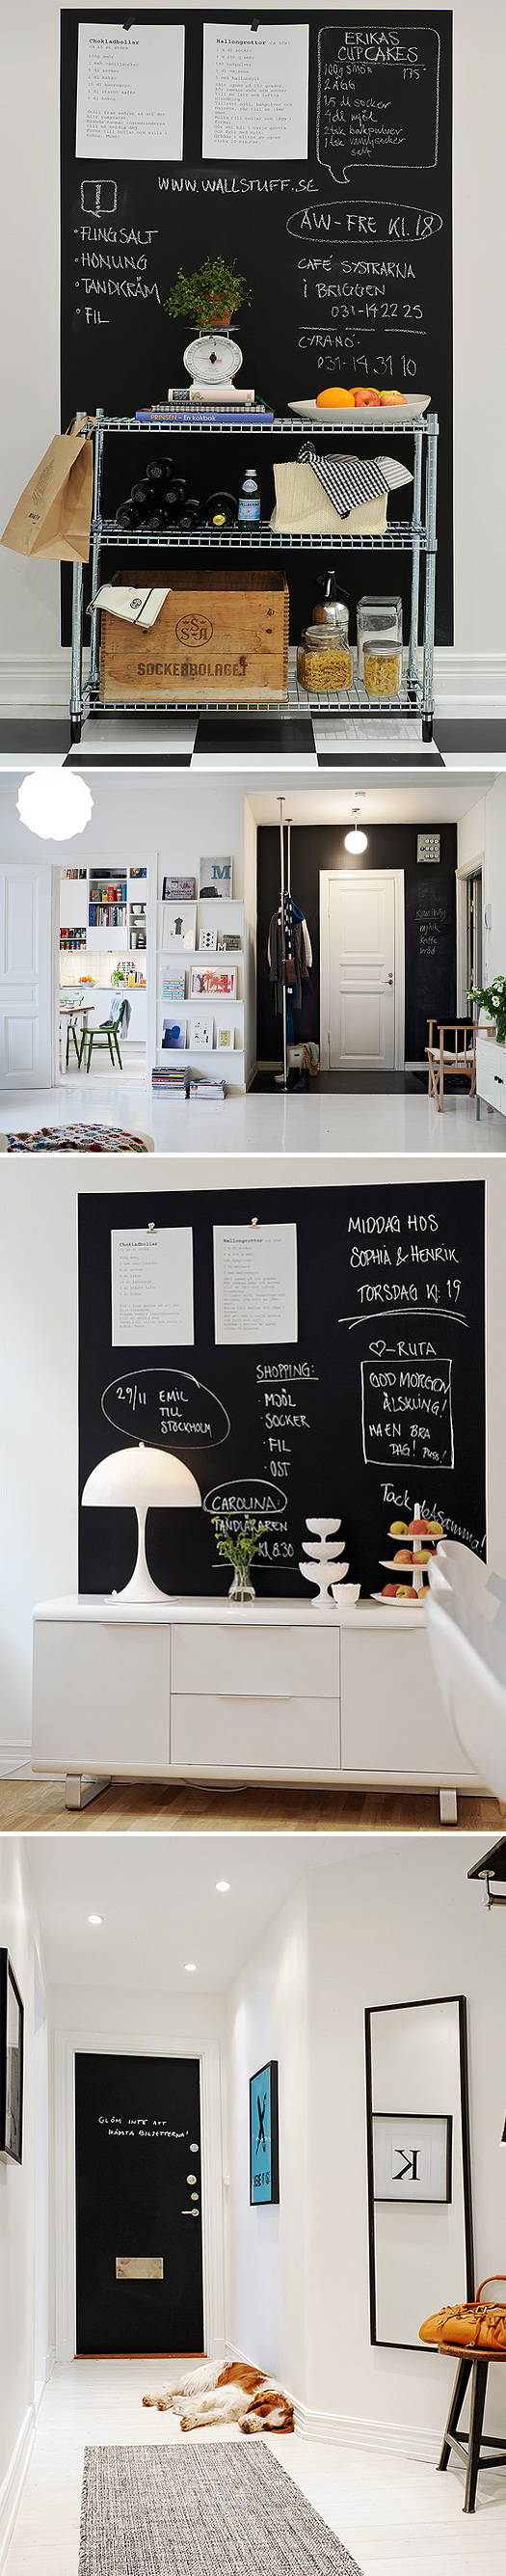 tableau noir en cuisine chiara stella home